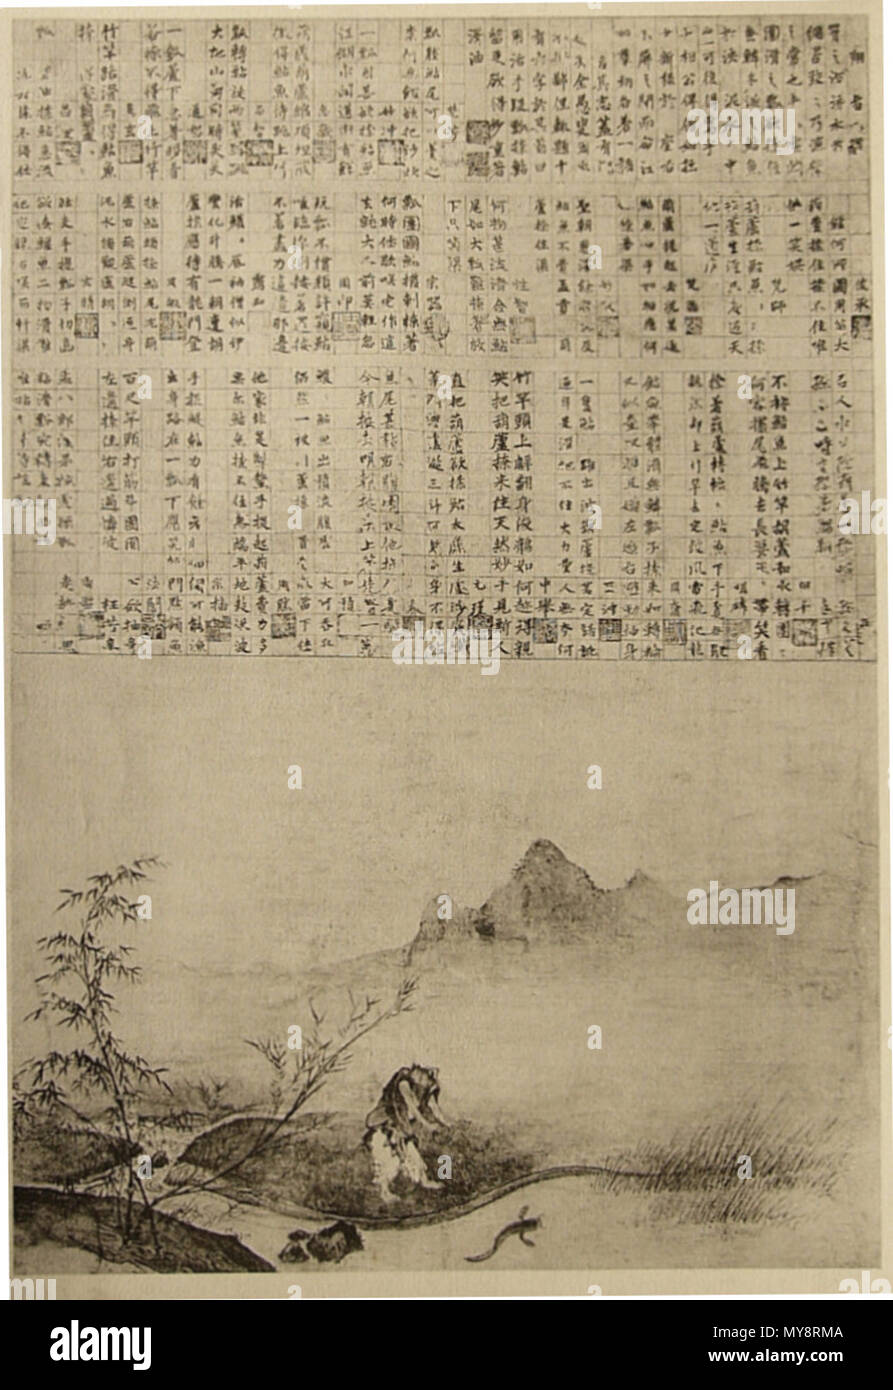 . English: Hyonen zu by Josetsu, painter from the Muromachi period, ca 1415, ink on paper, 111.5cm height, 75.8cm wide, Taizo-in, Myoshin-ji, Kyoto, Japan 日本語: 瓢鯰図、如拙、紙本水墨 111.5cm x75.8cm 京都 妙心寺、室町時代1415年ごろ . about ACE1415. Jyosetsu 251 Hyonen zu by Josetsu0 - Stock Image